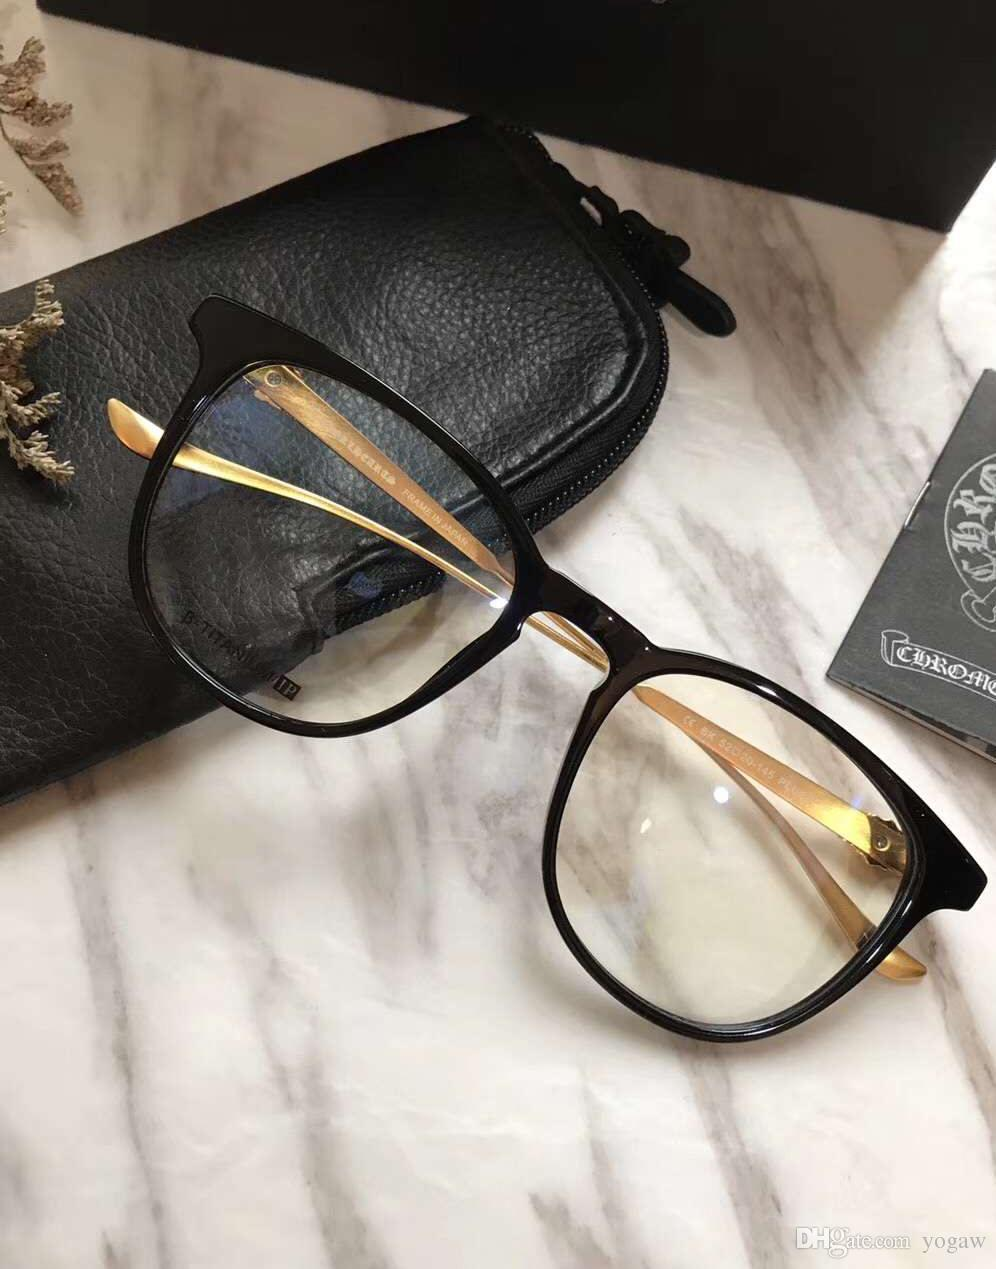 27ec6ff6dc87 2019 Mens Chrome Pluck Black Gold Eyeglasses Frame Glasses 52mm Fashion  Beautiful Optical Eyewear New With Box From Yogaw, $60.92 | DHgate.Com